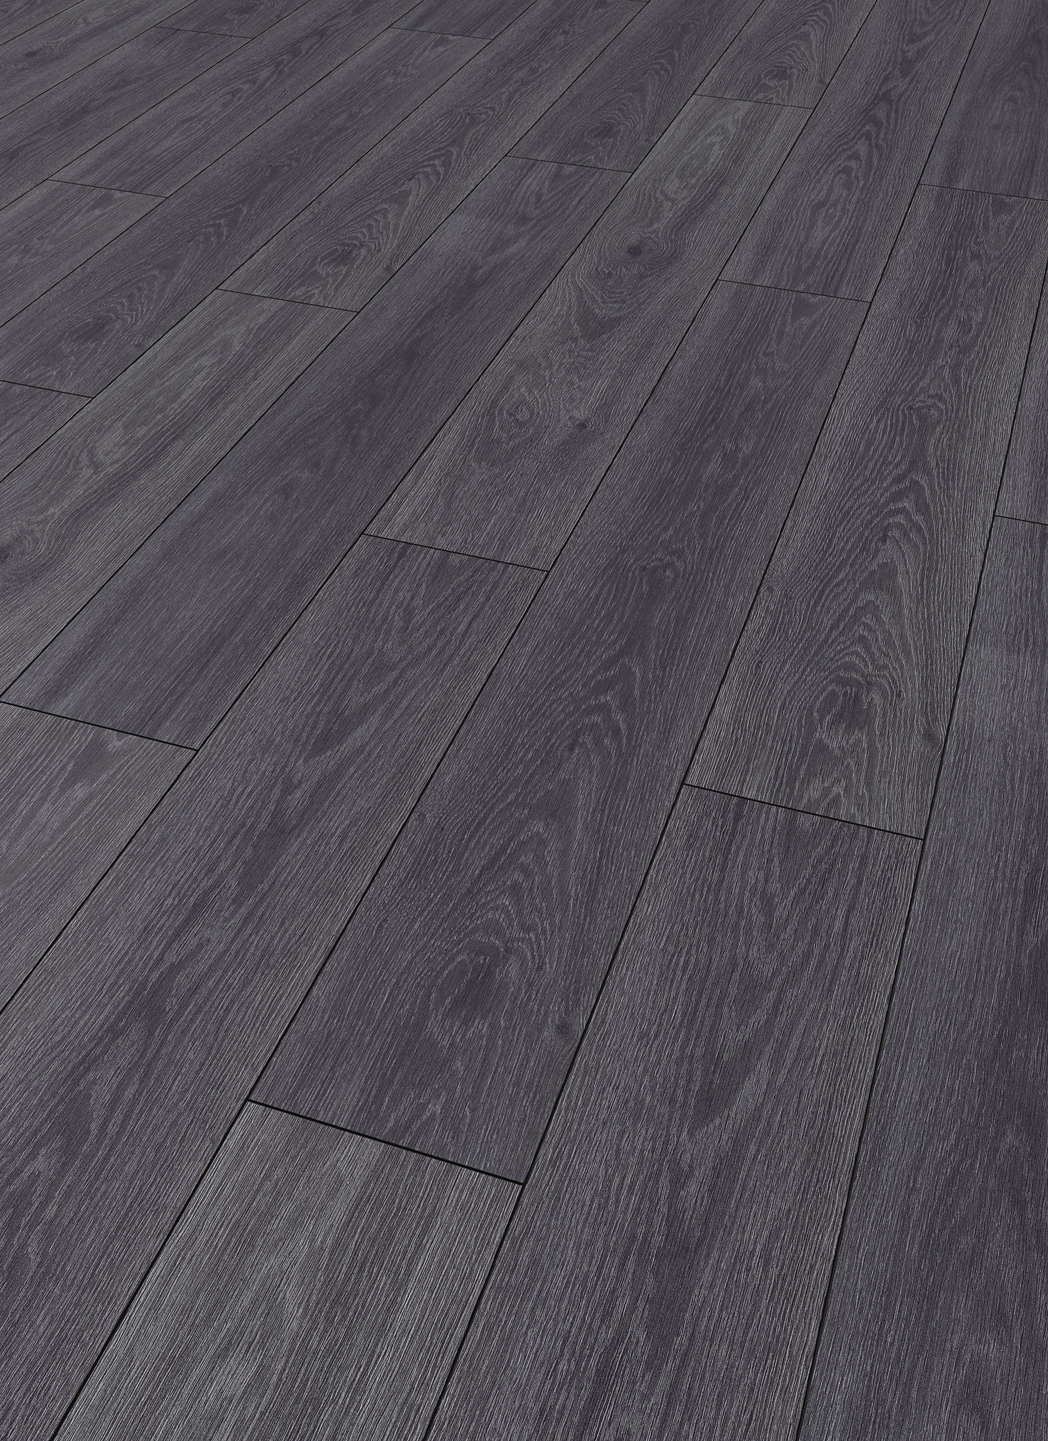 Acoustic Underlay For Hardwood Floors